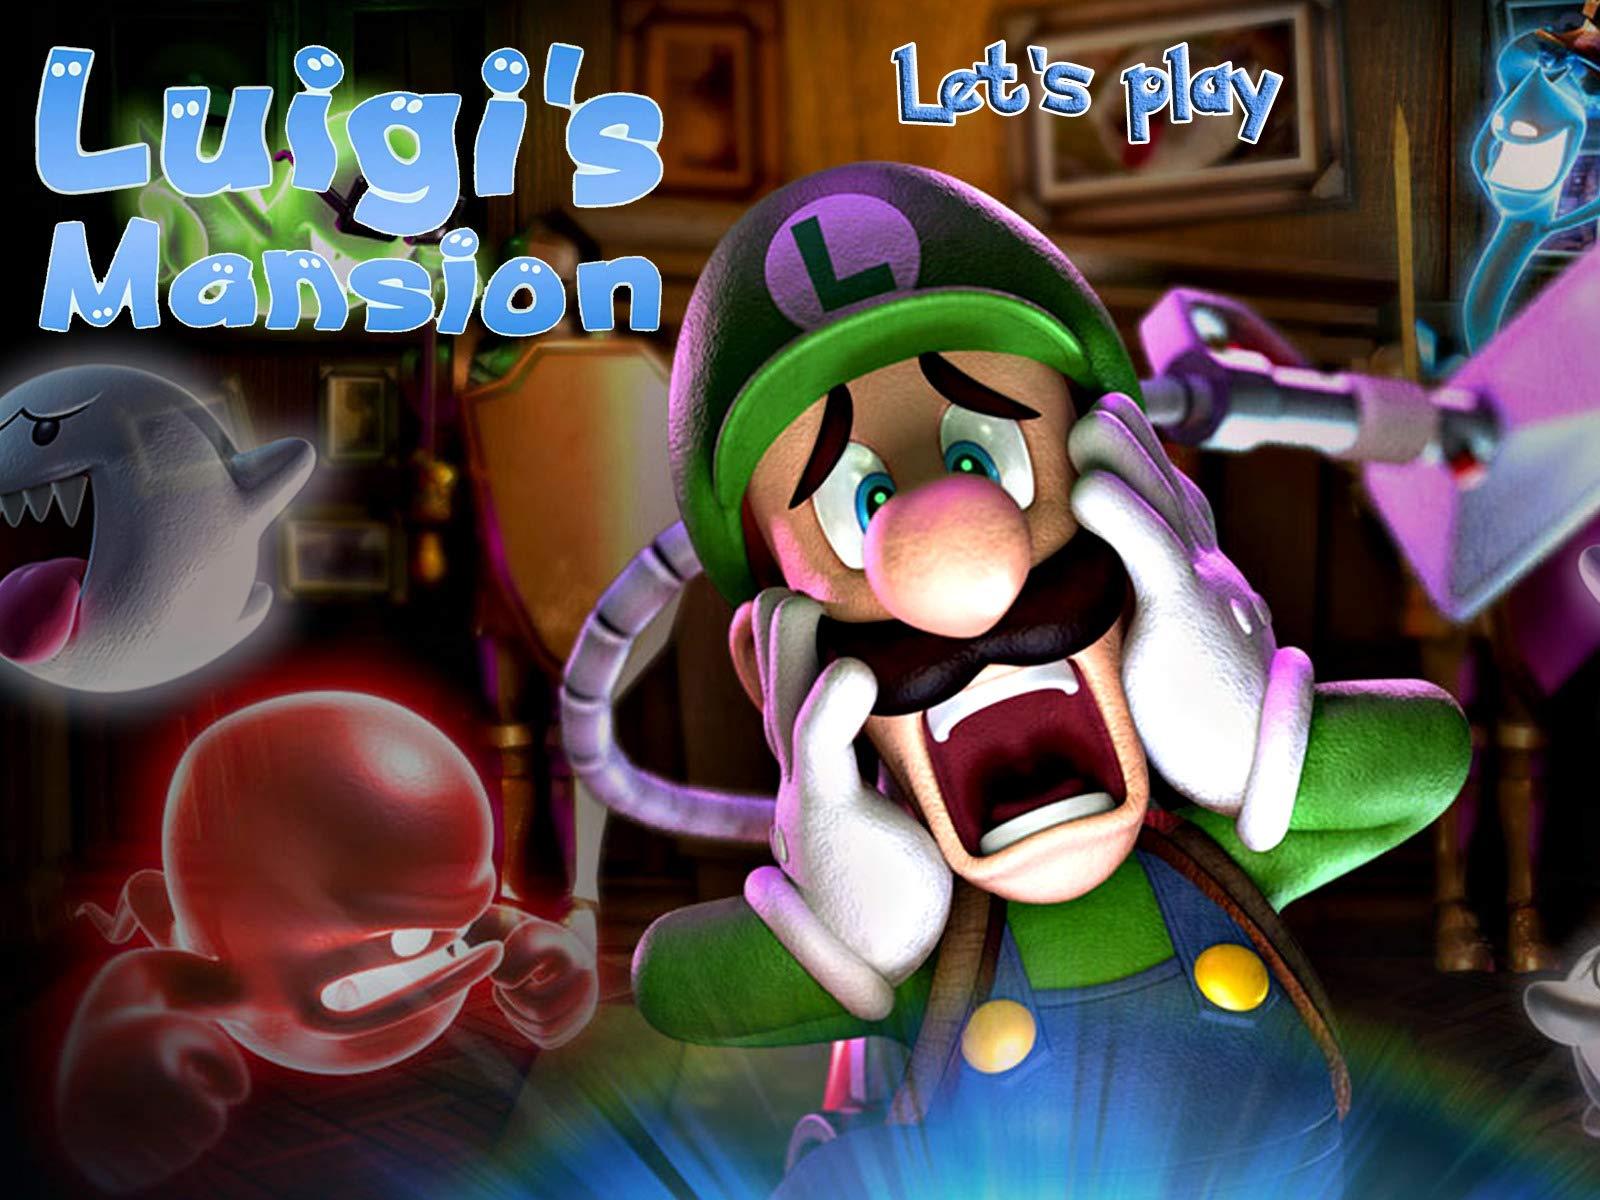 Clip: Luigi's Mansion - Let's play on Amazon Prime Instant Video UK